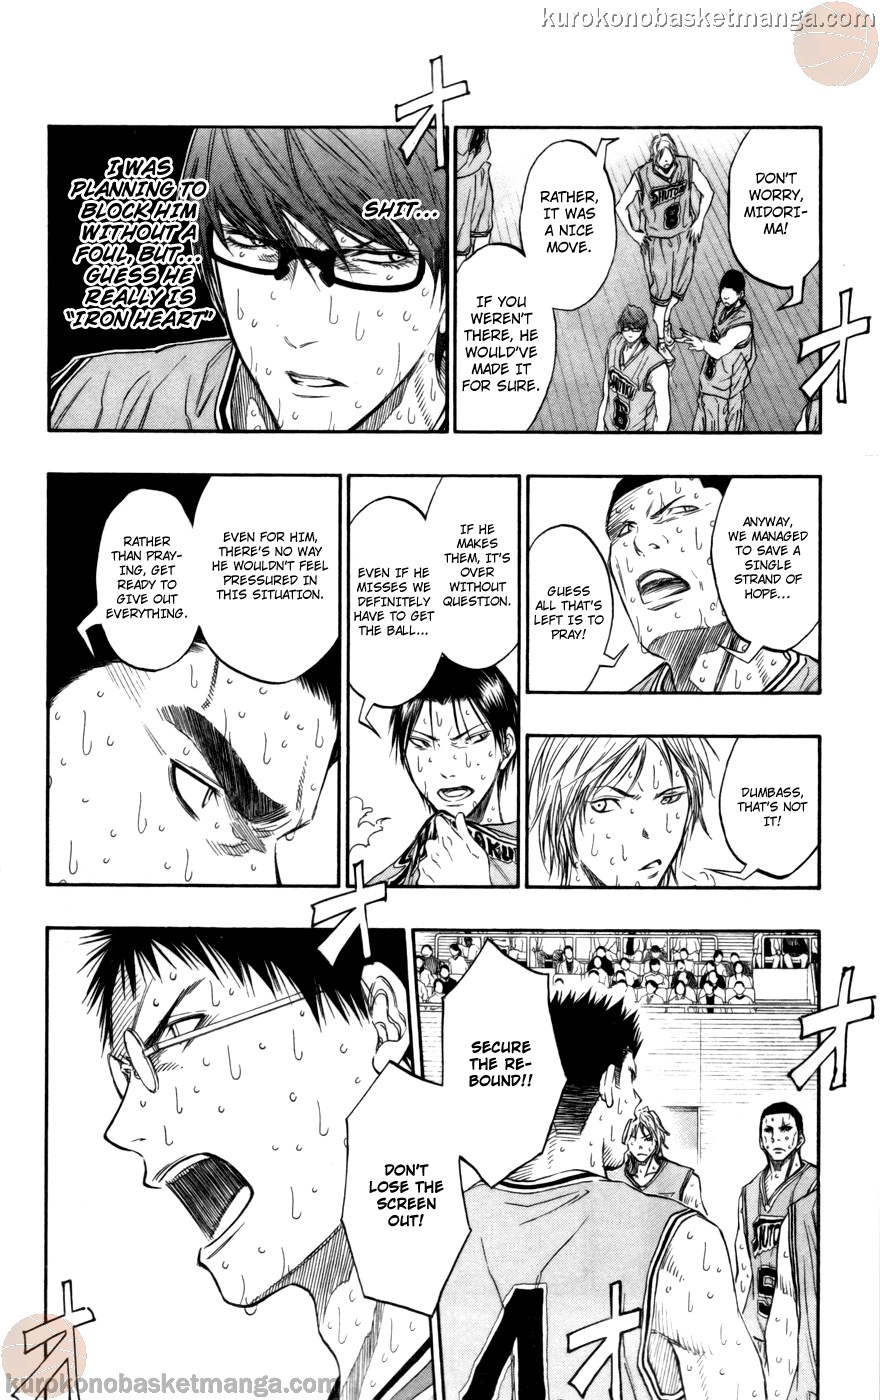 Kuroko no Basket Manga Chapter 92 - Image 08